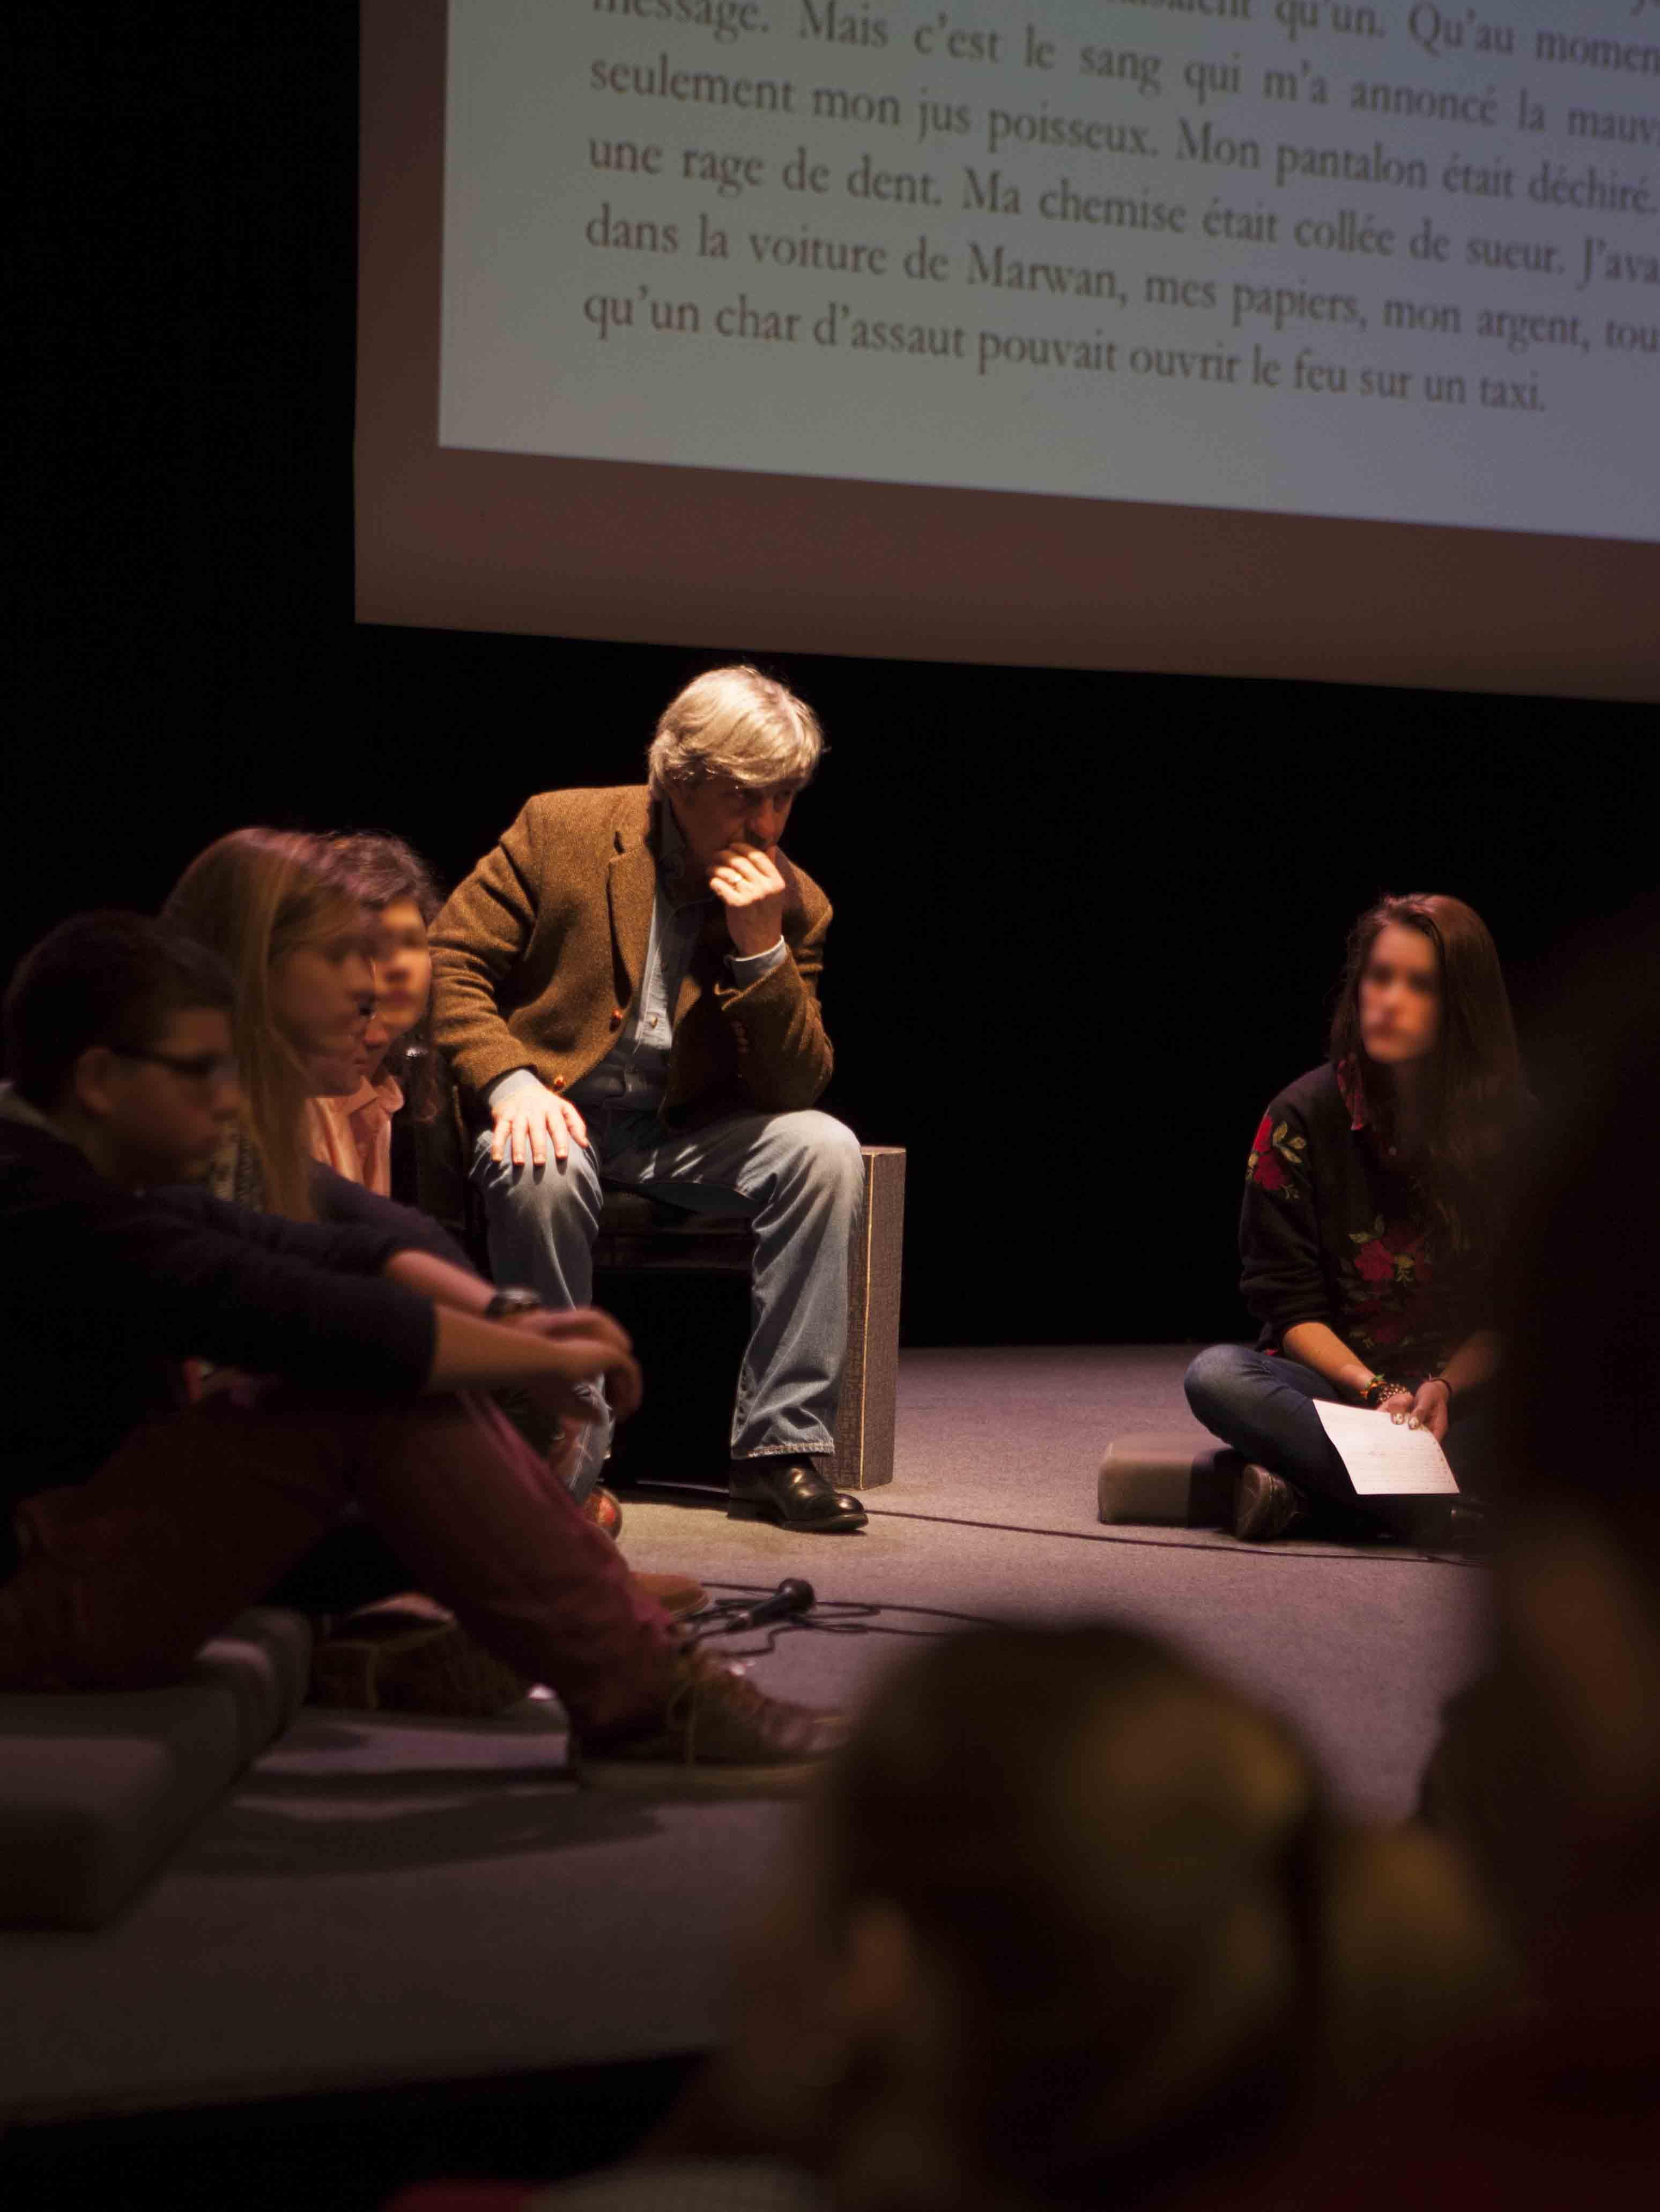 2013 Chalandon Rencontres nationales Goncourt des lyceens ©BruitDeLirePatriceNormand